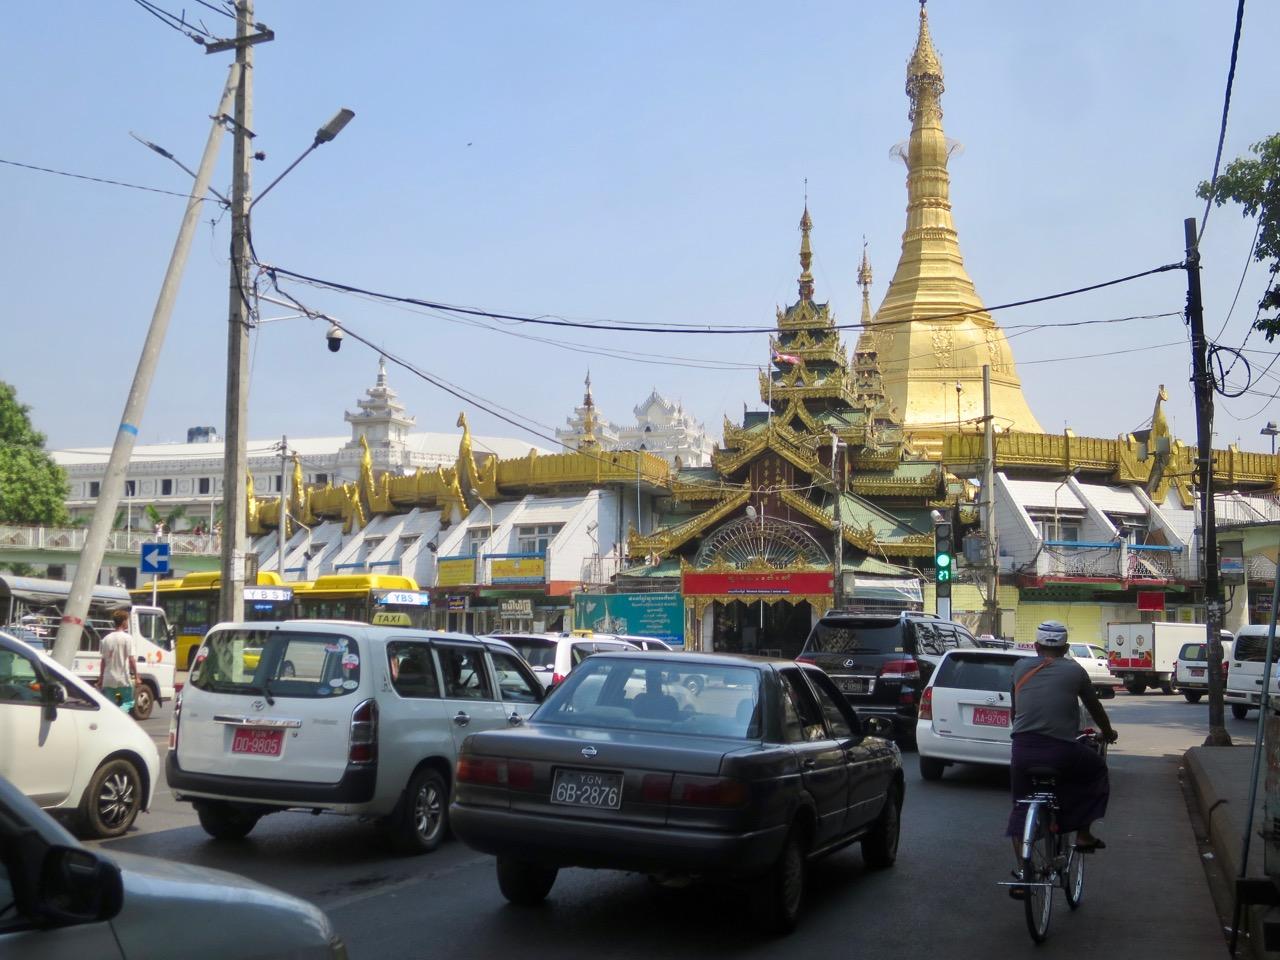 Onibus em Myanmar 1 09